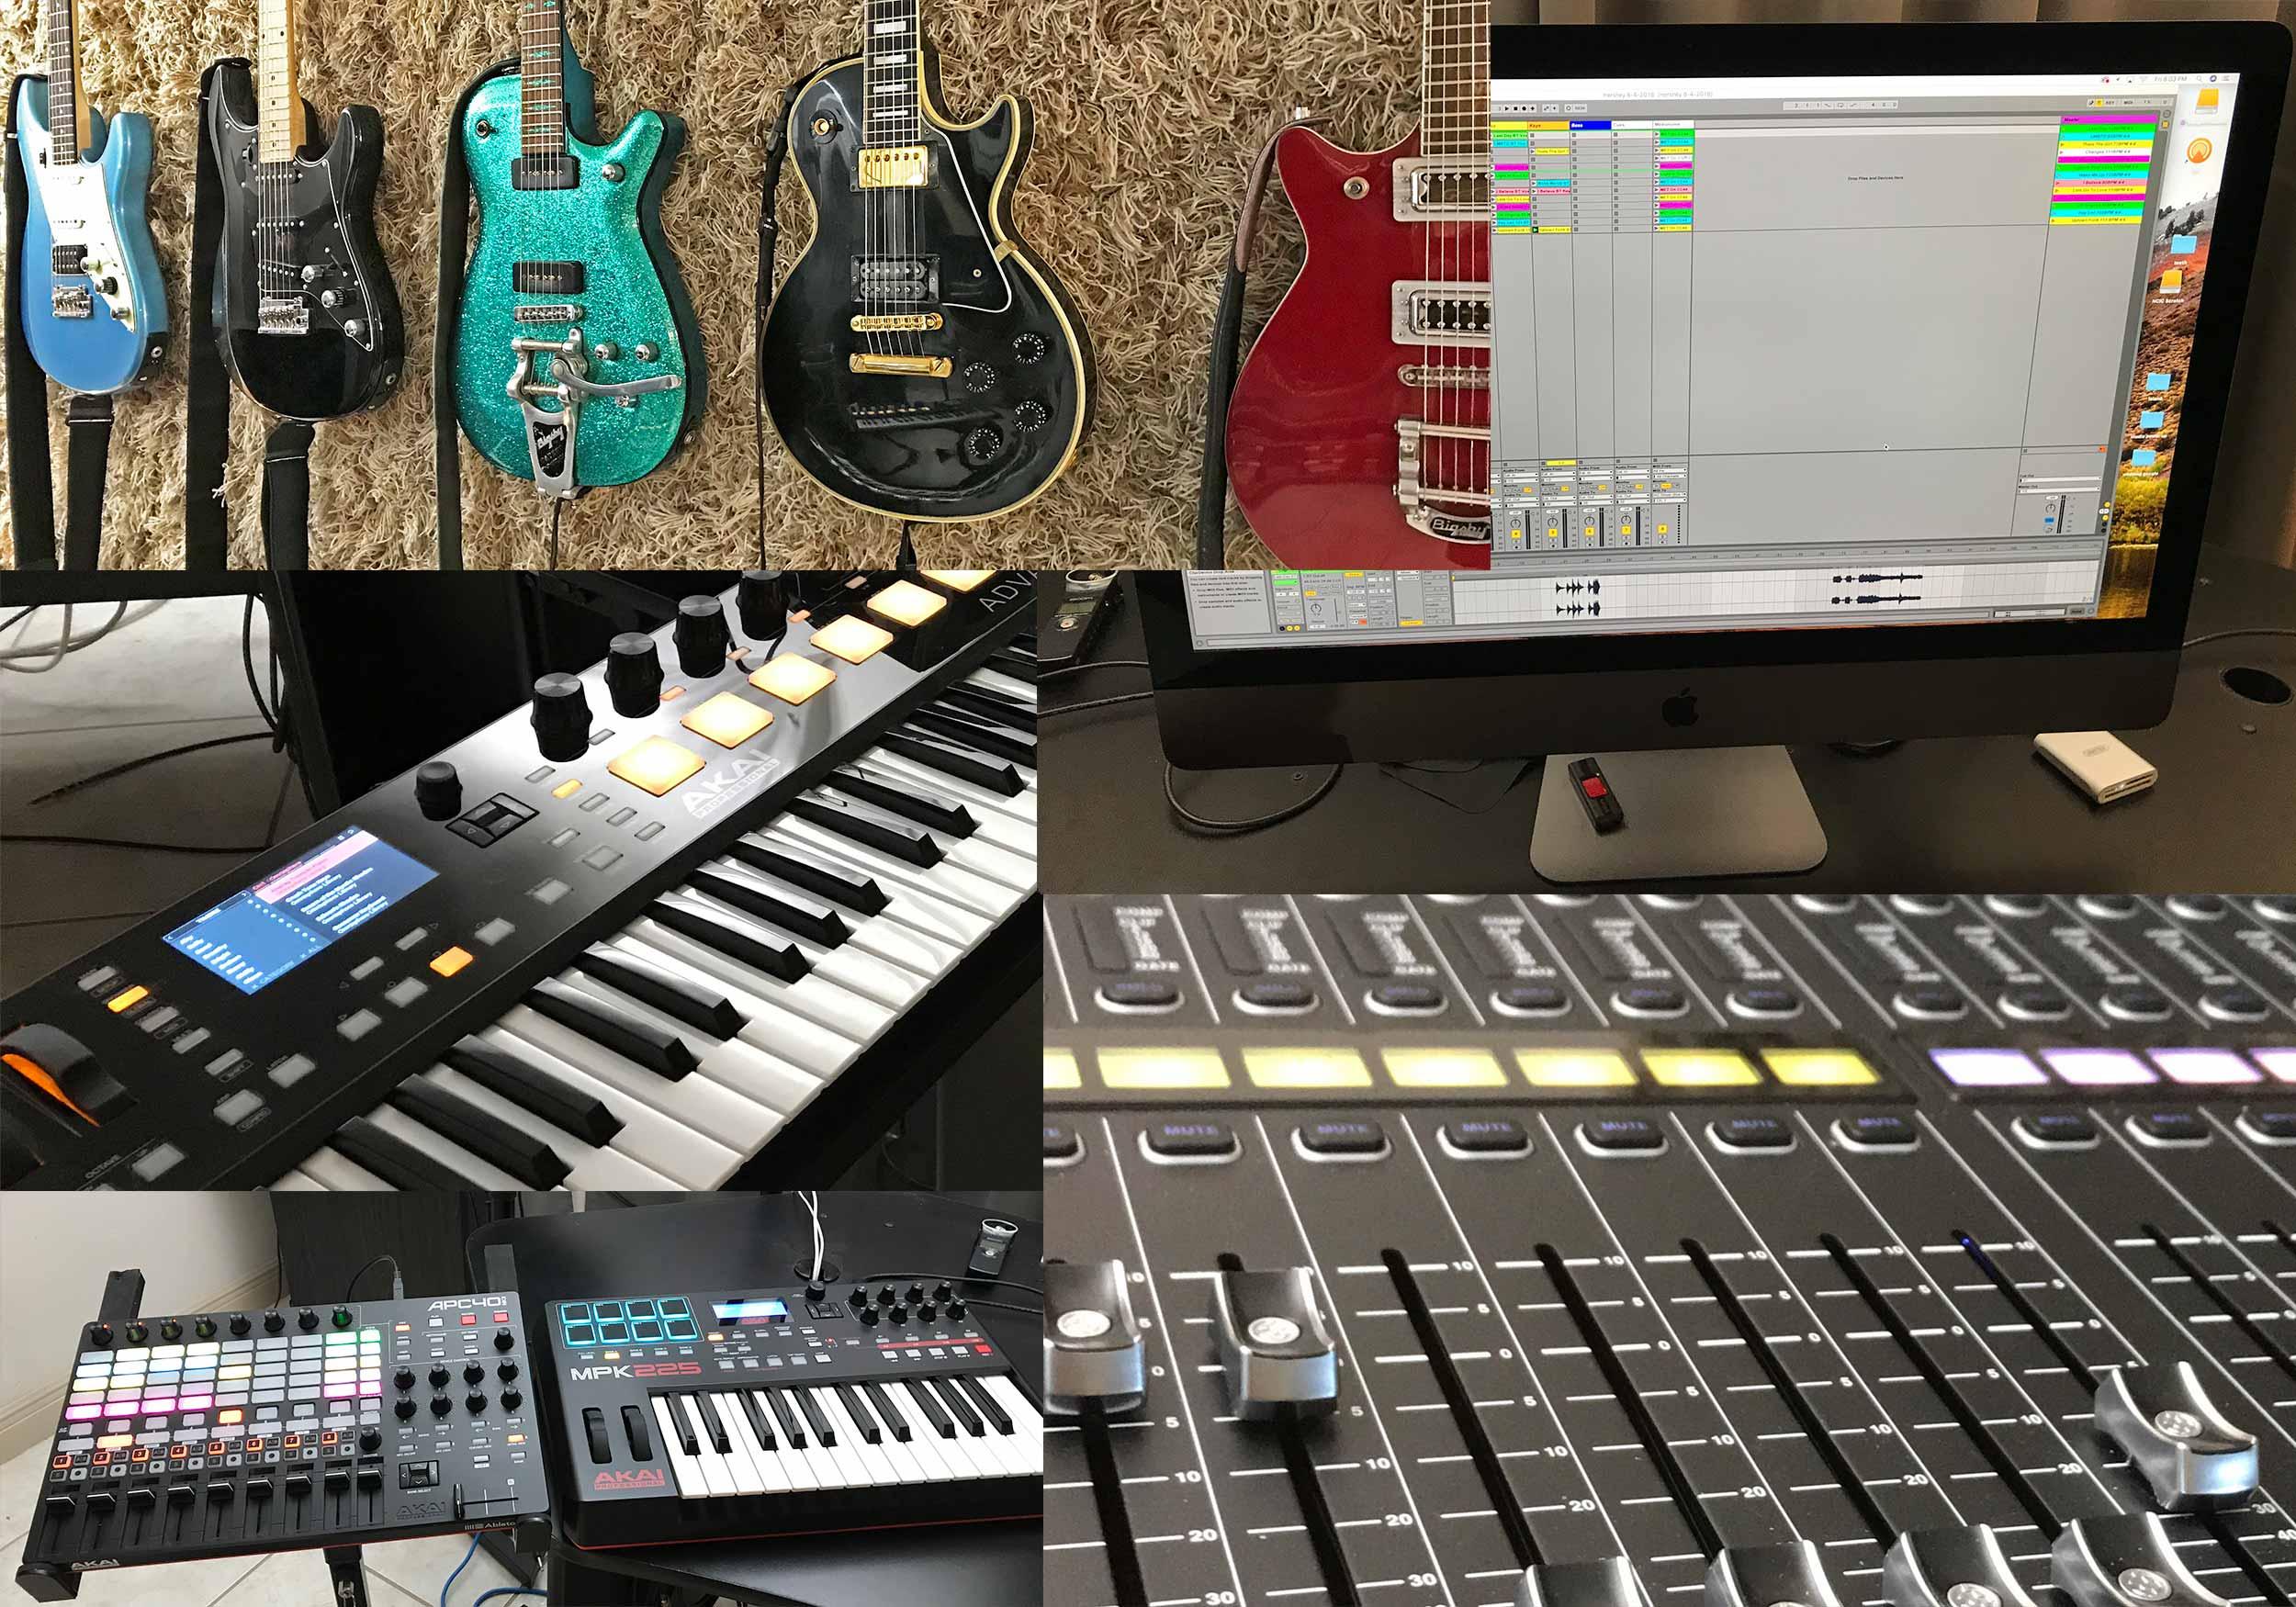 Recording - Studio or Live